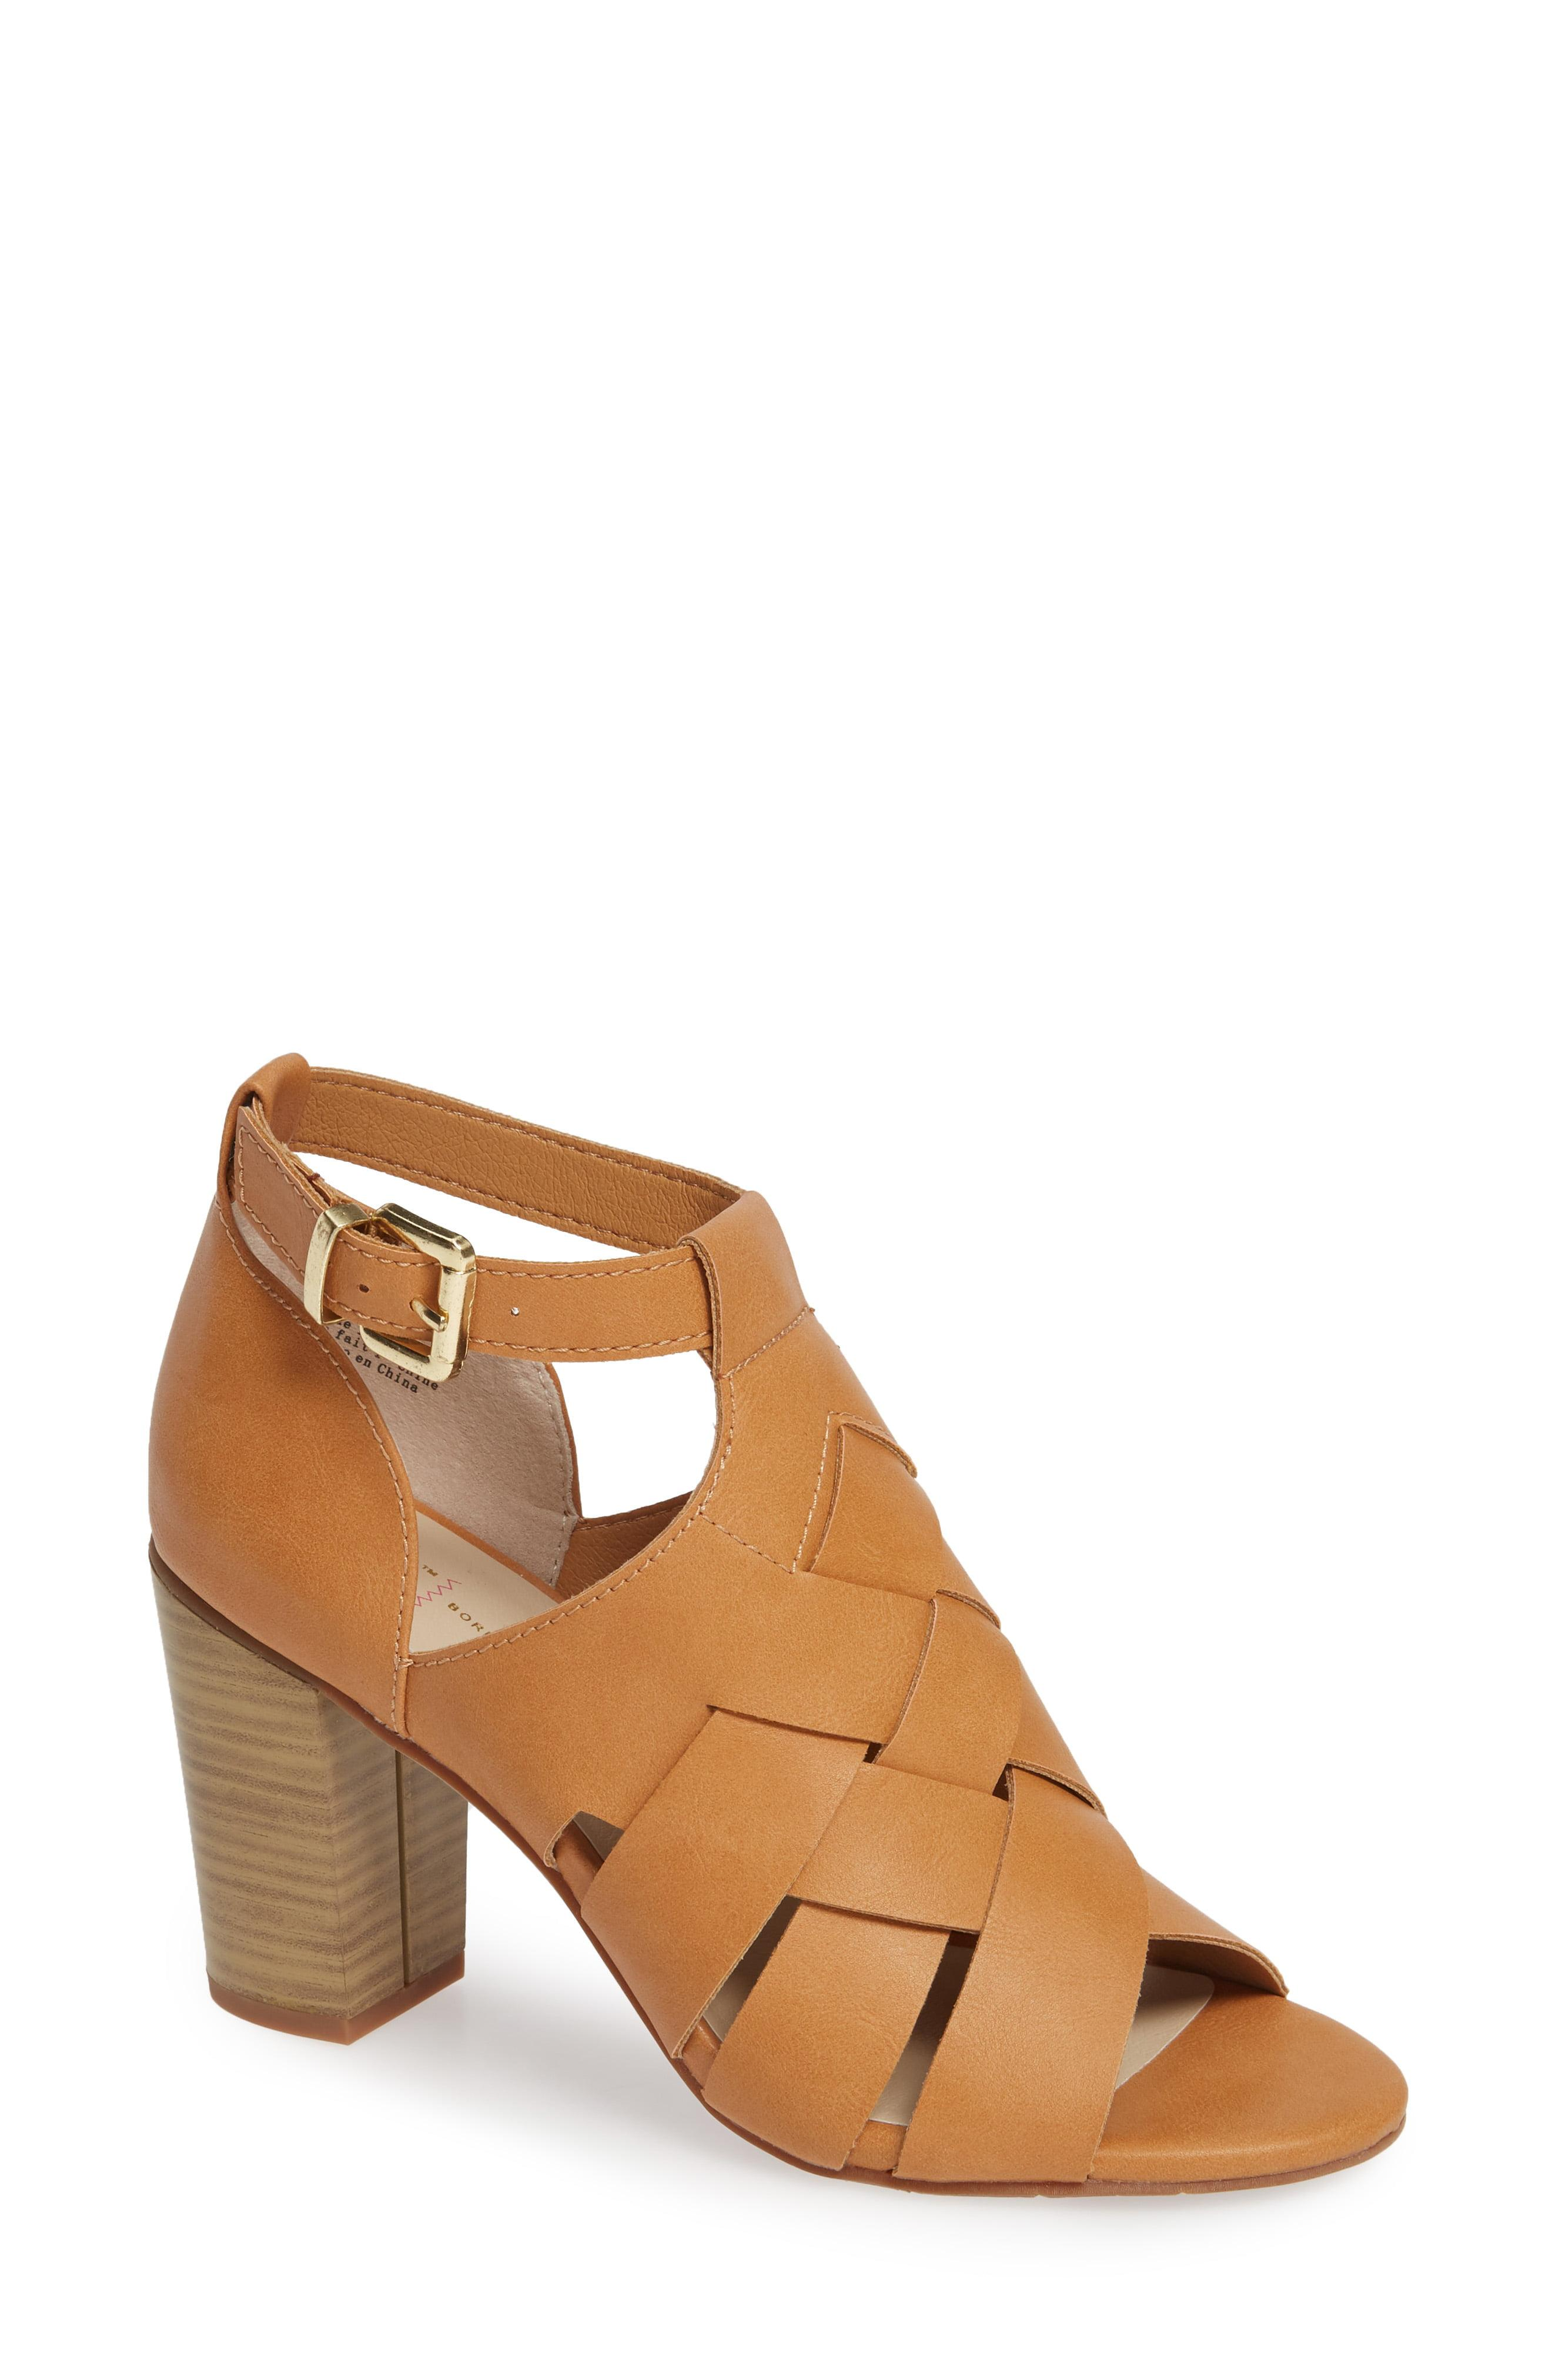 d03fae2264d5 Lyst - BC Footwear Pathway Vegan Block Heel Sandal in Brown